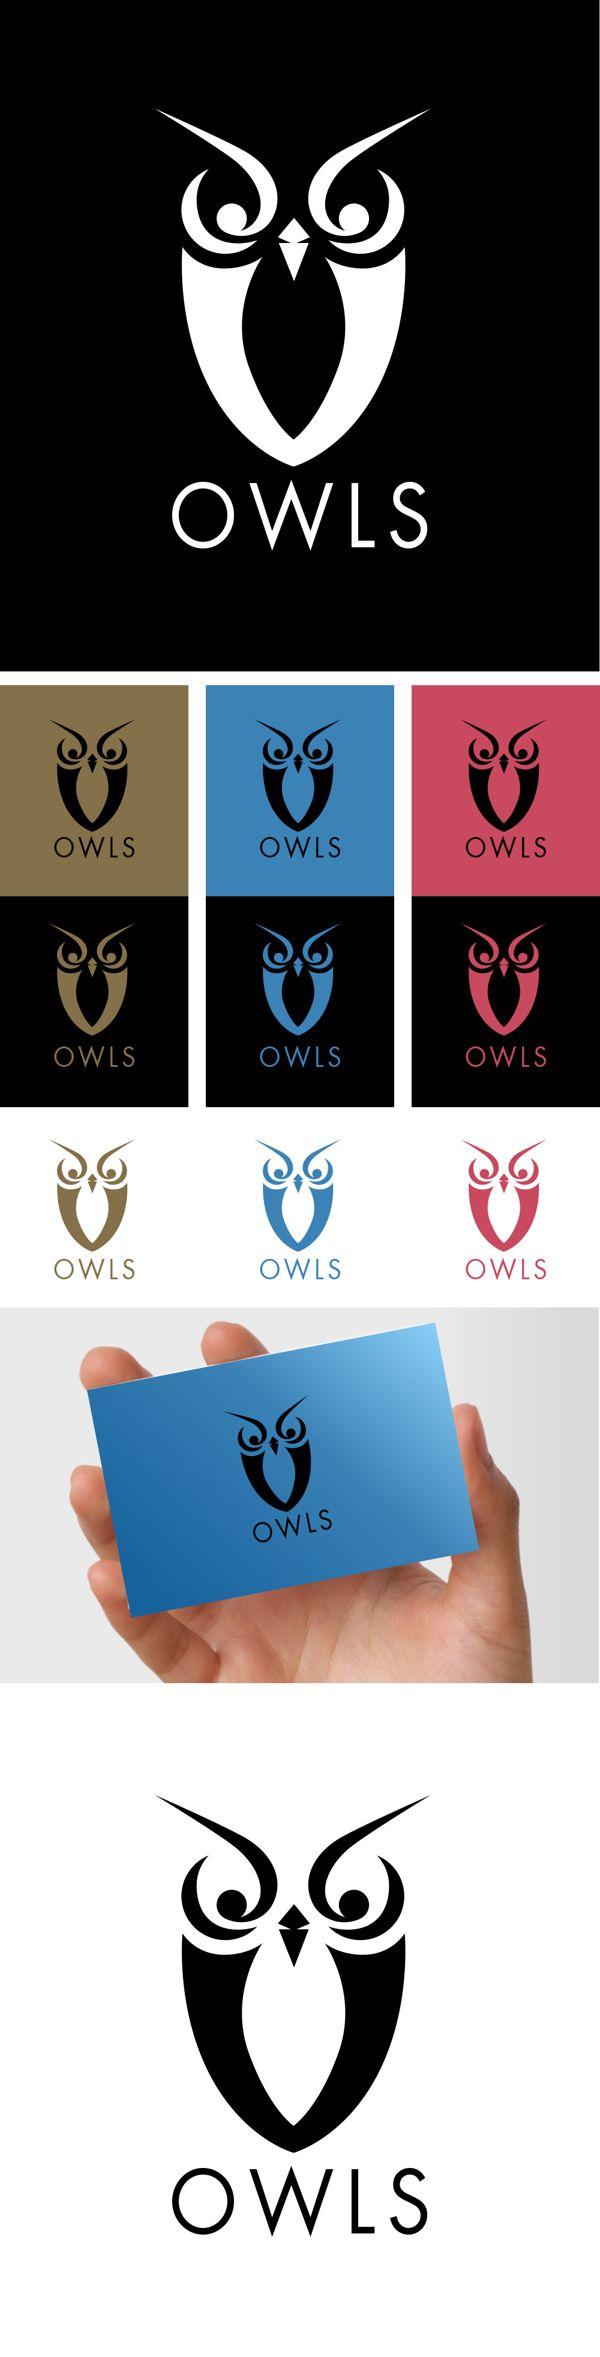 OWLS by Polkapixel , via Behance